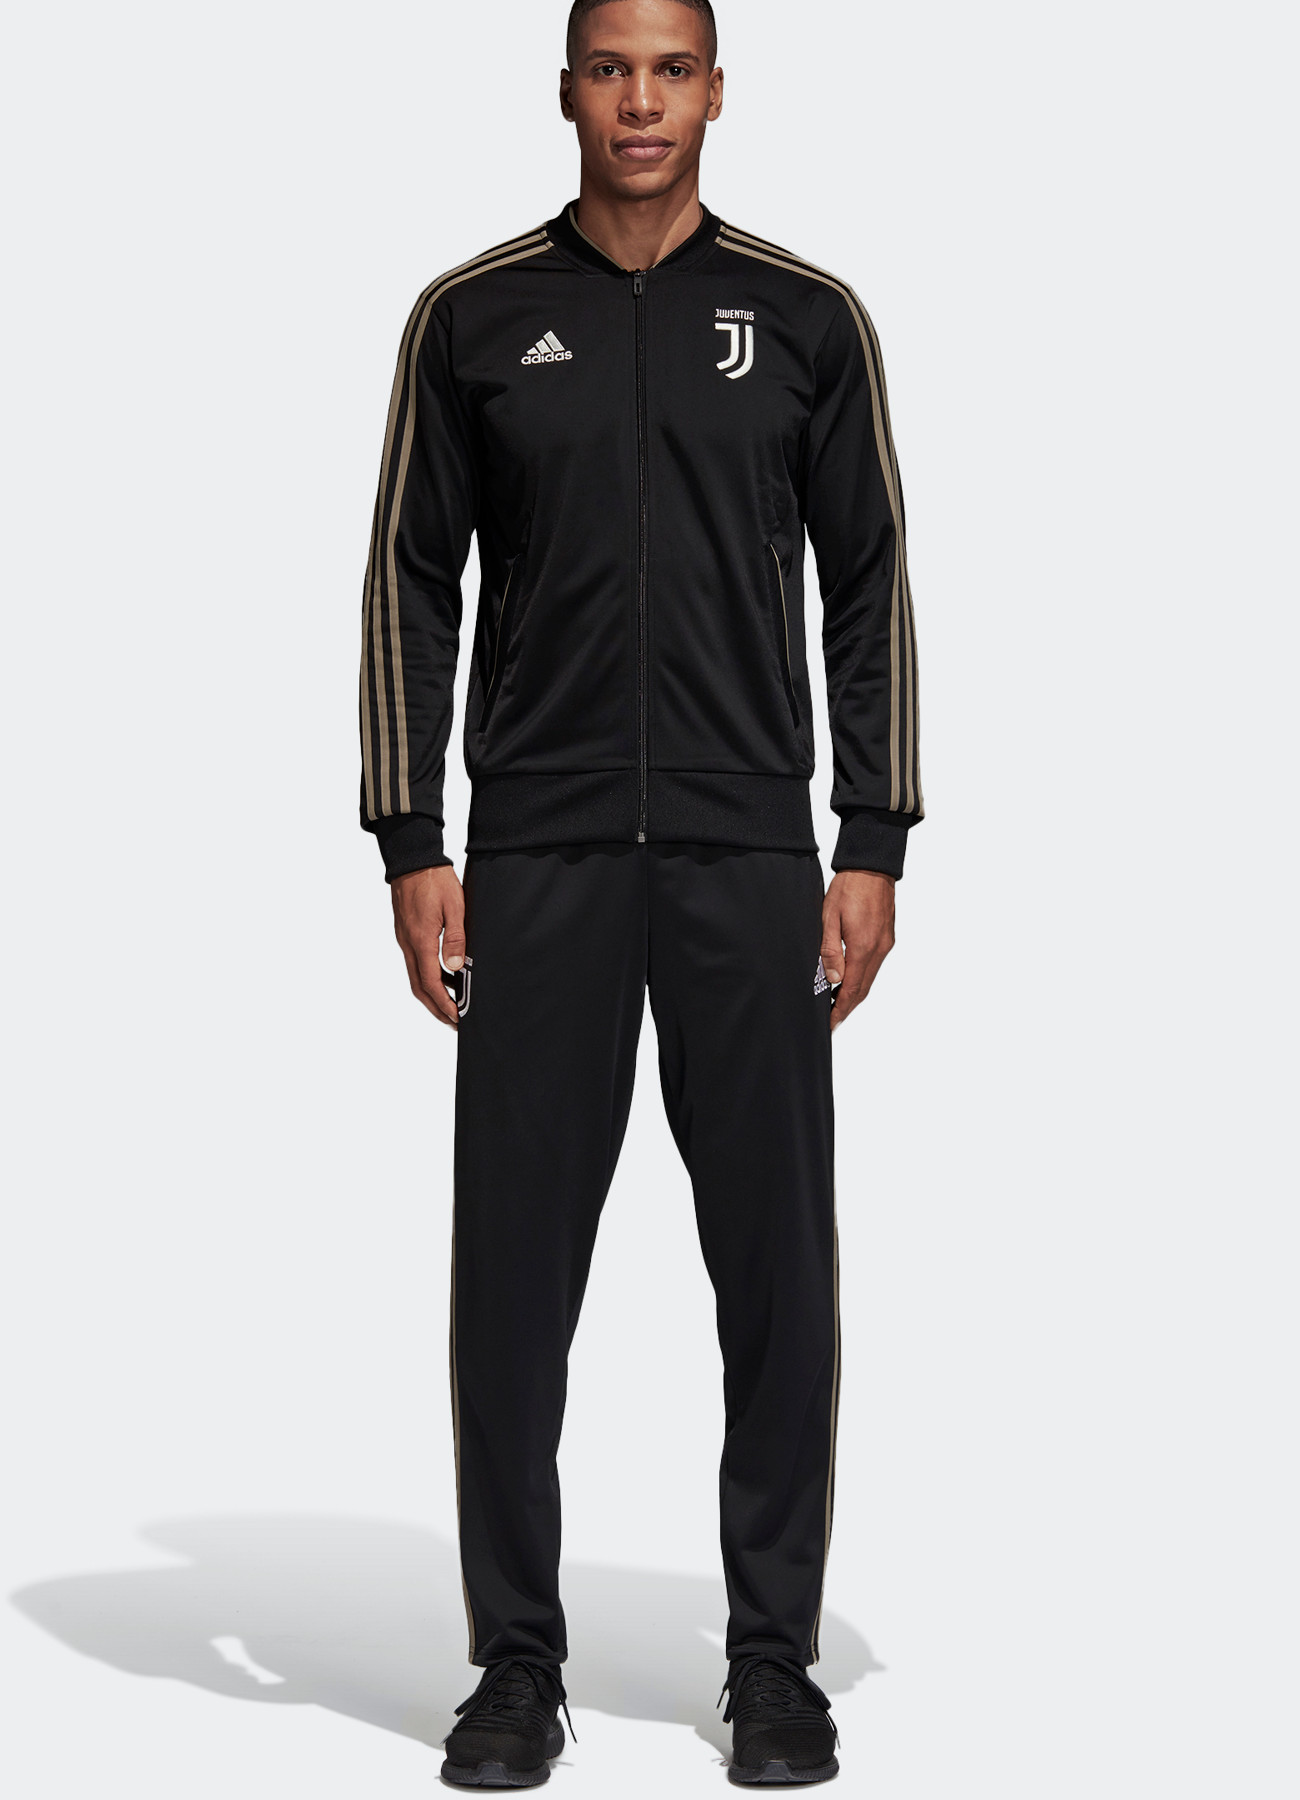 b0f9dbfee FC Juventus Adidas Training Tracksuit 2018 19 Black Pes Bench ...